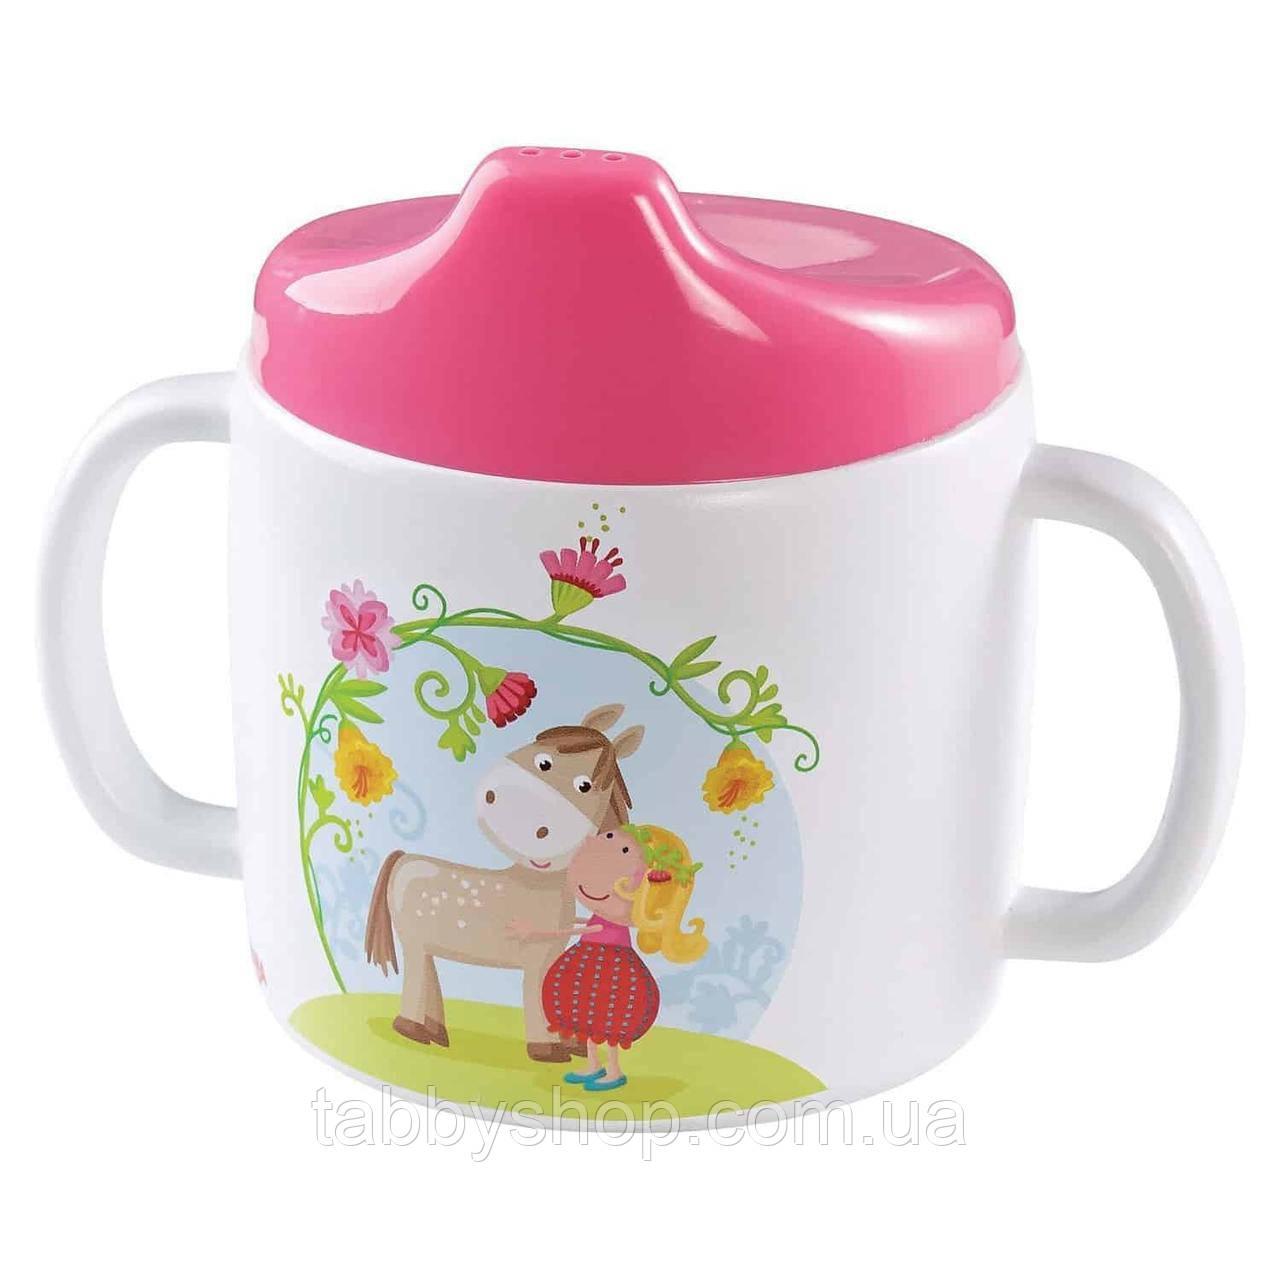 Чашка-непроливайка HABA Мой пони